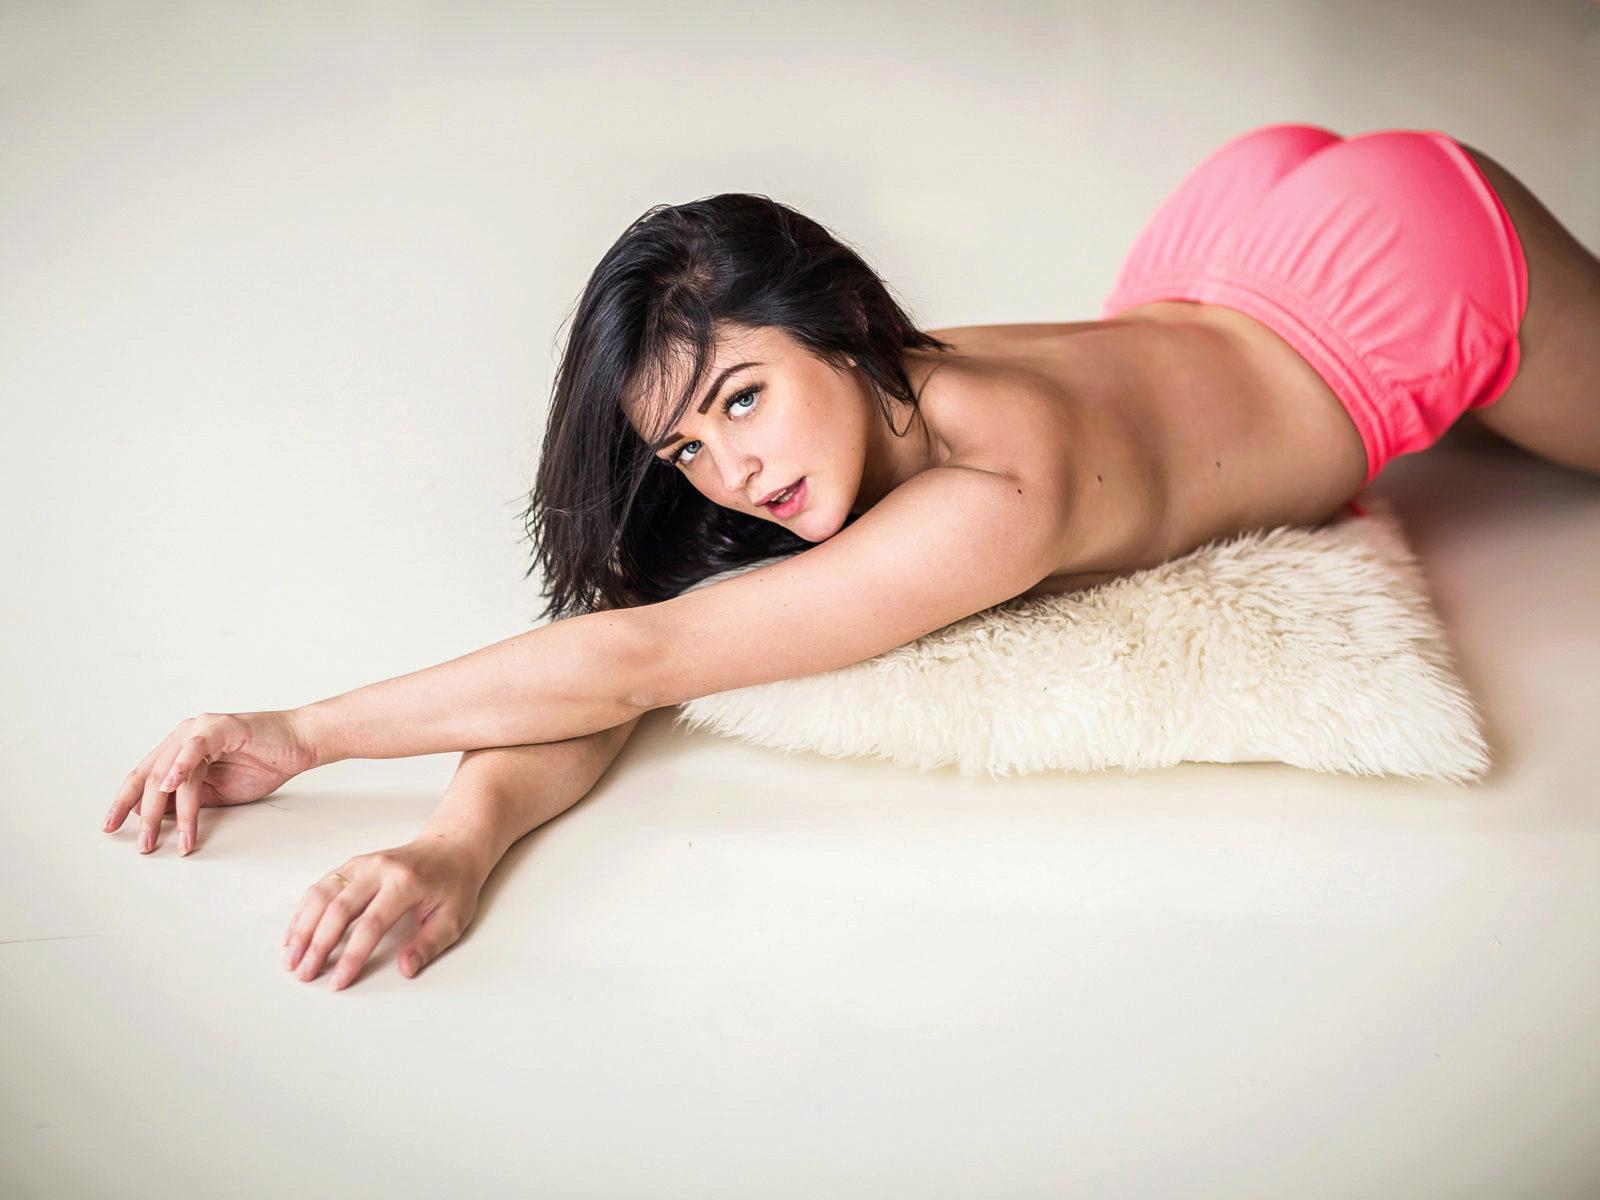 MeganGreene